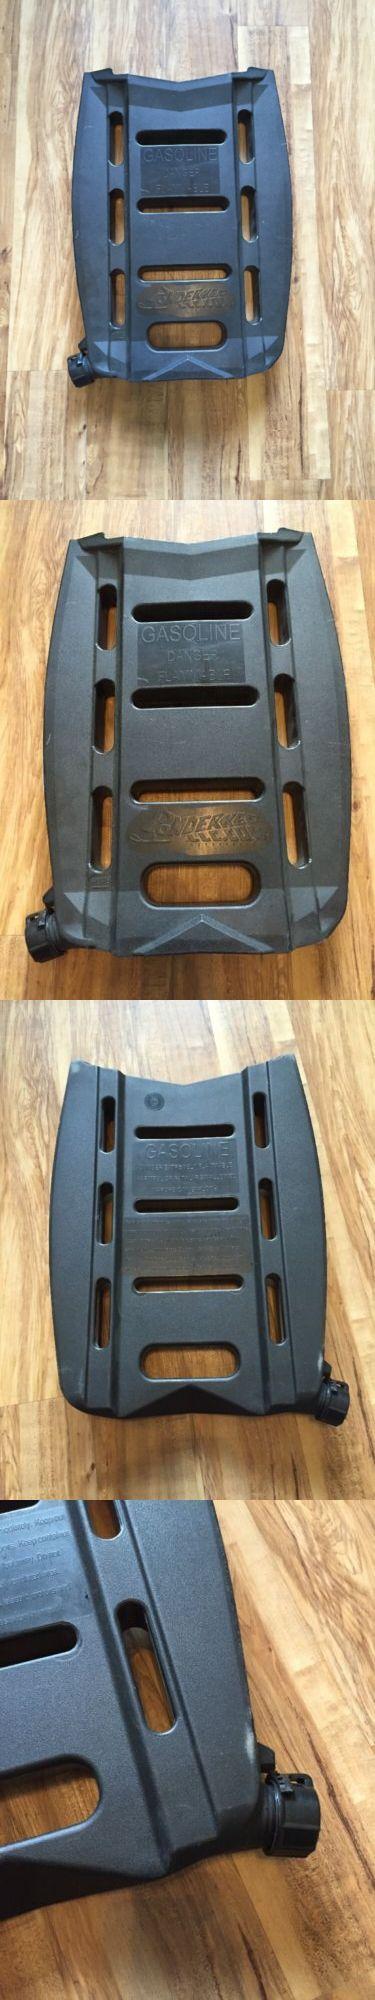 Snowmobile Parts 23834: New Powder Keg D-Xp-146-F (2 Gallon) Fuel Keg For Ski-Doo Snowmobiles Read -> BUY IT NOW ONLY: $58.49 on eBay!